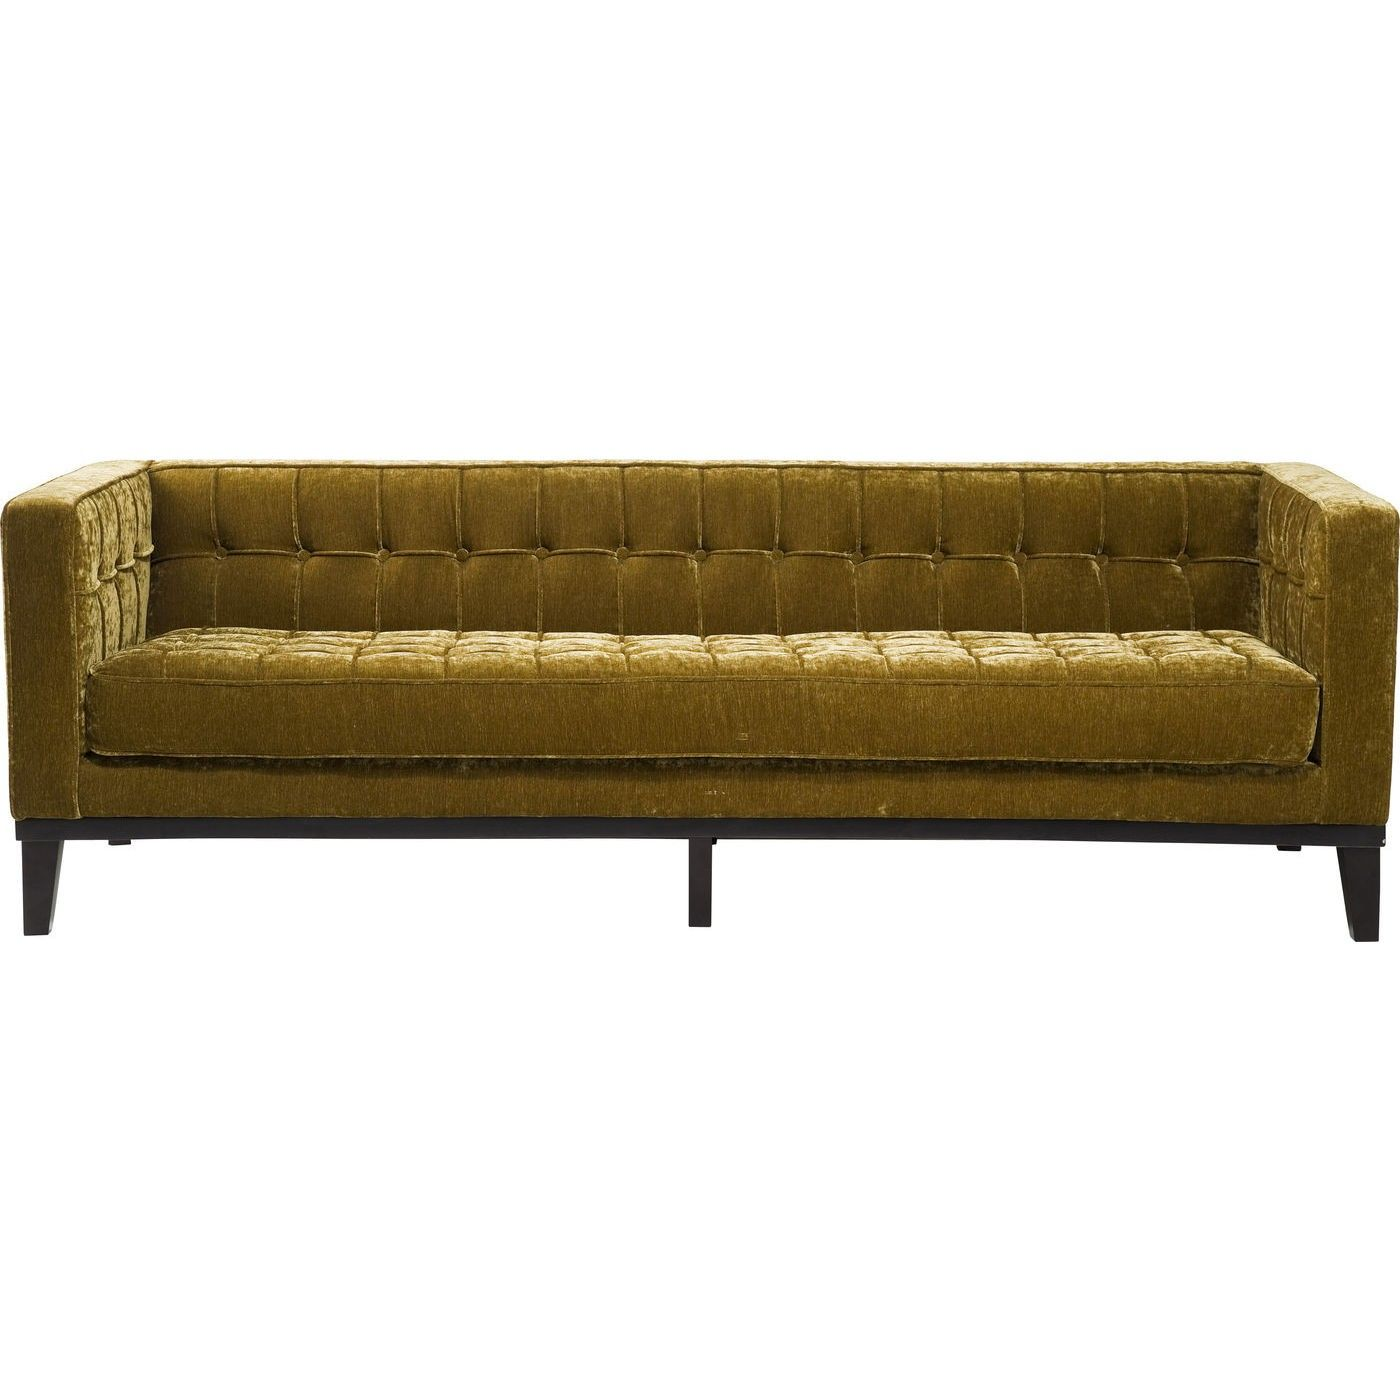 Sofa My Desire Samt 3 Sitzer Rubin